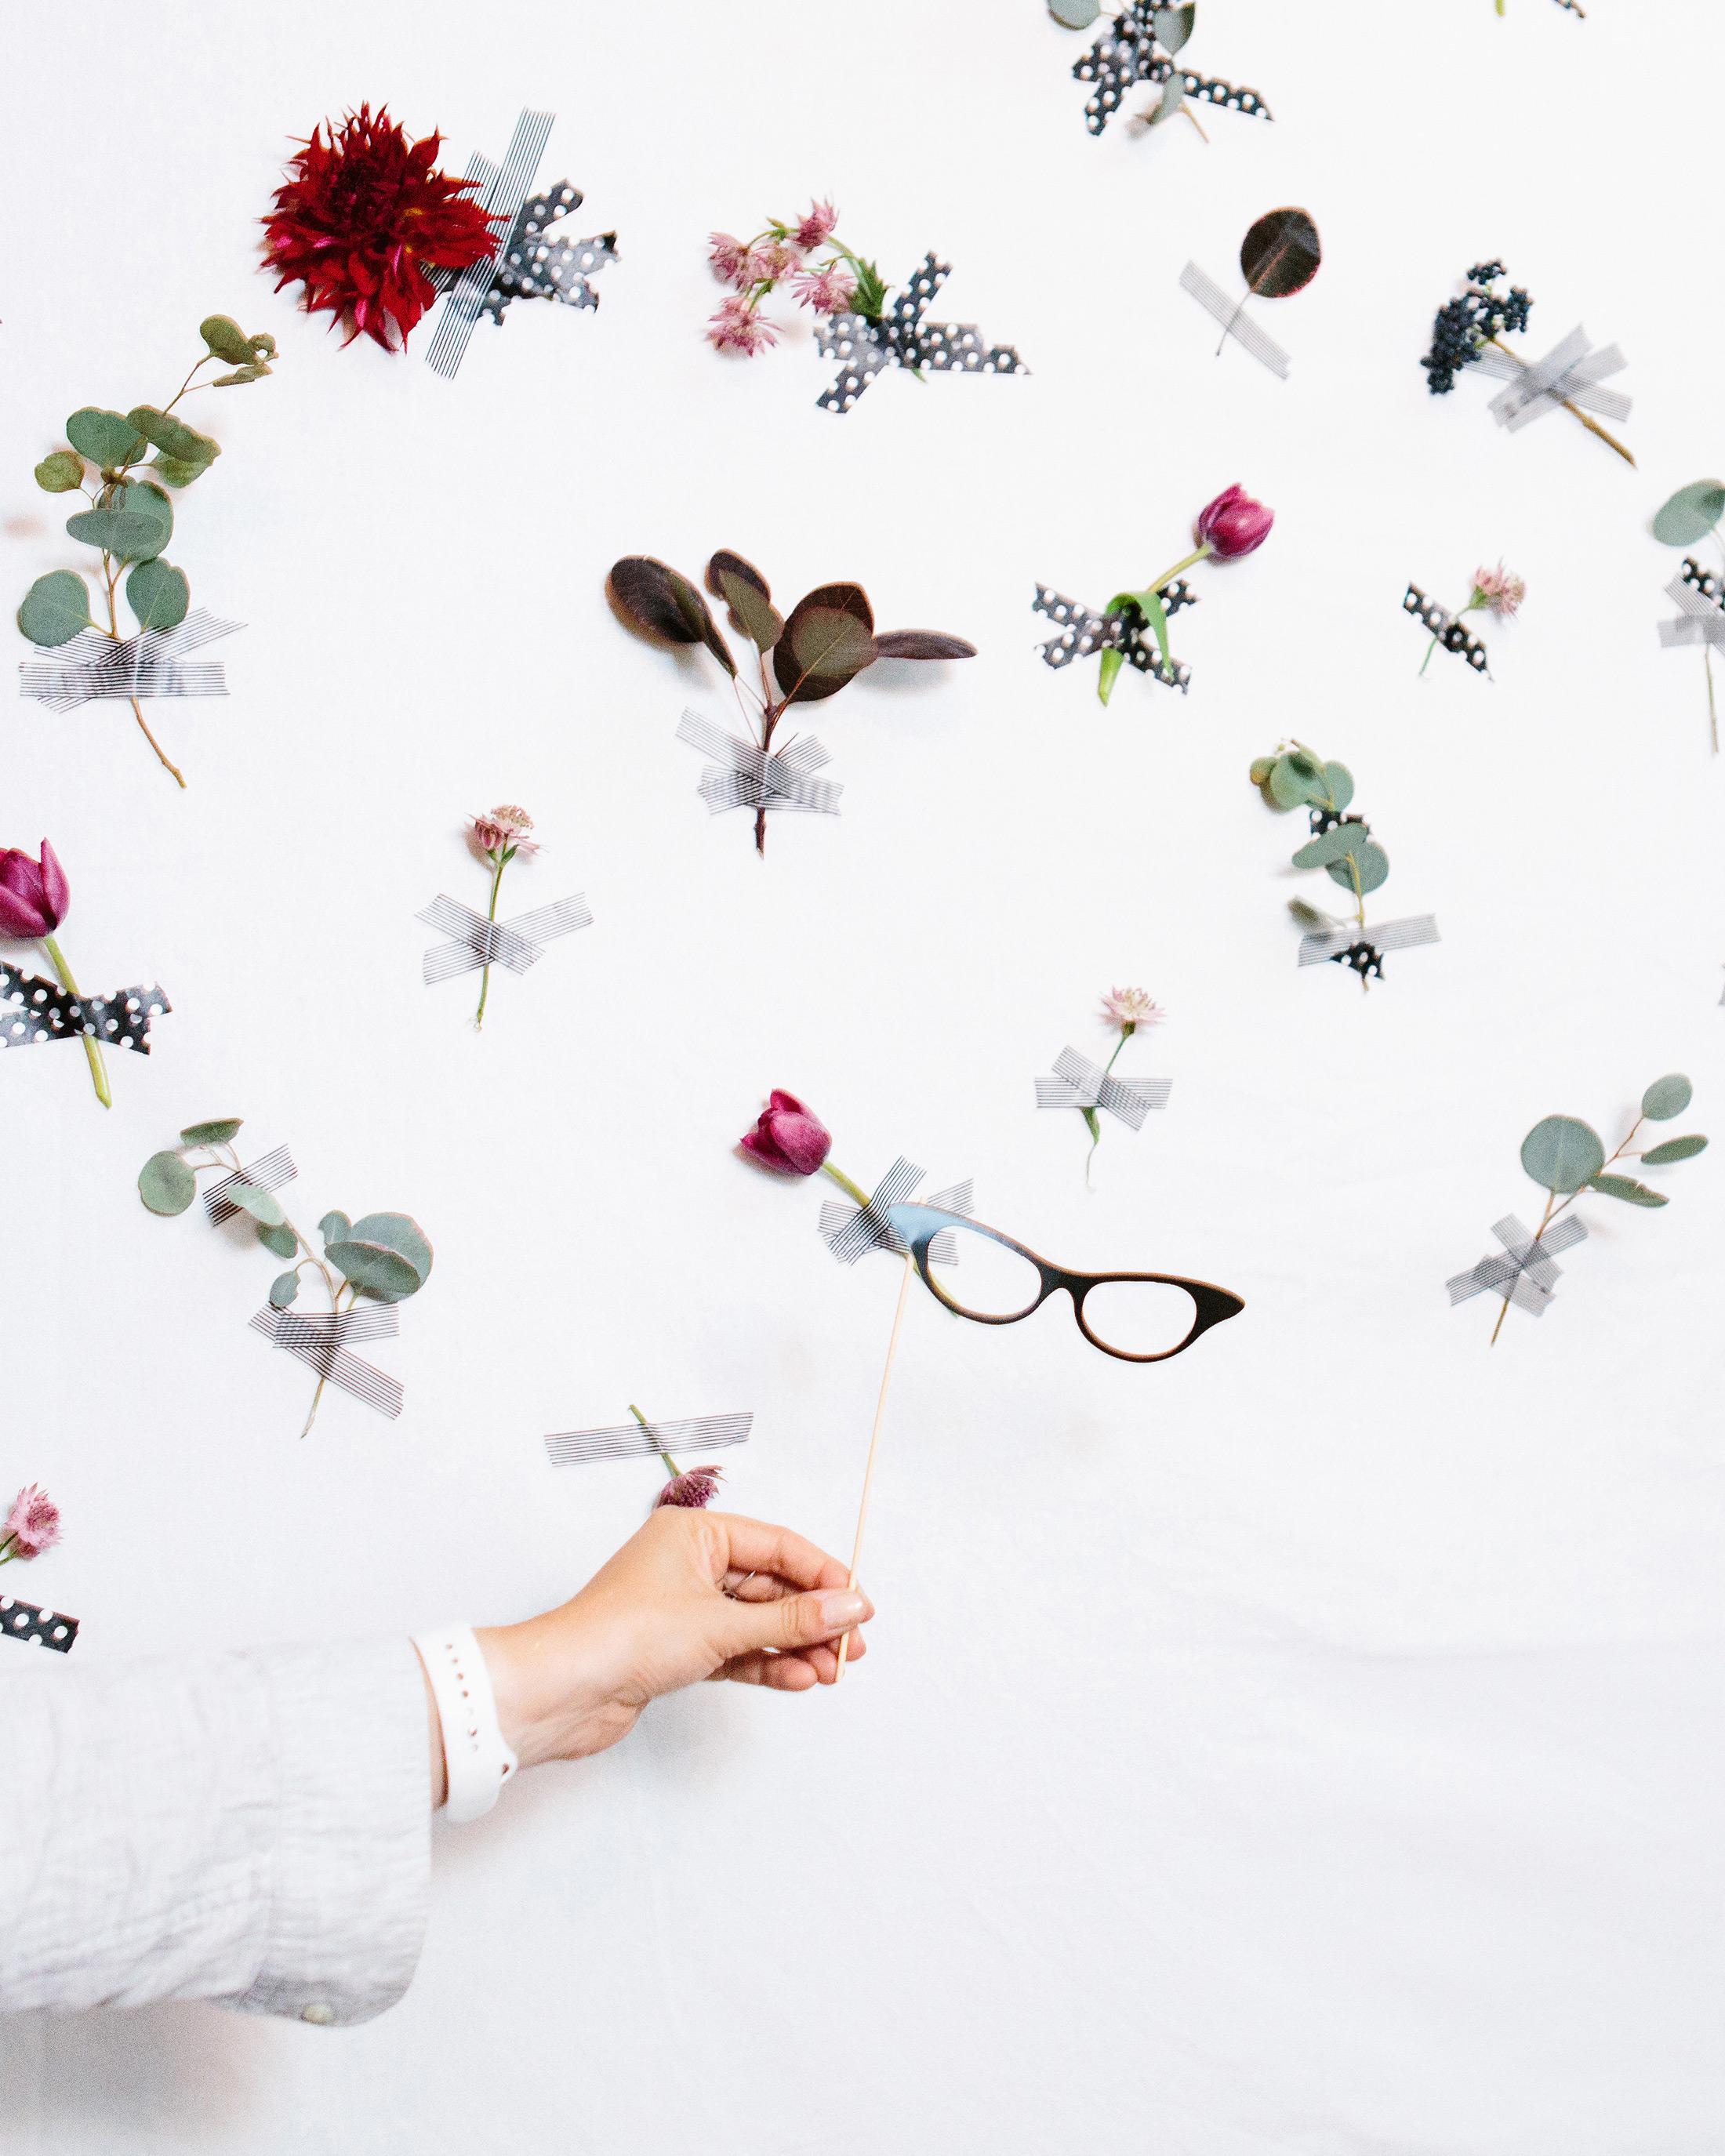 danielle-brian-wedding-flower-wall-1148-s113001-0616.jpg